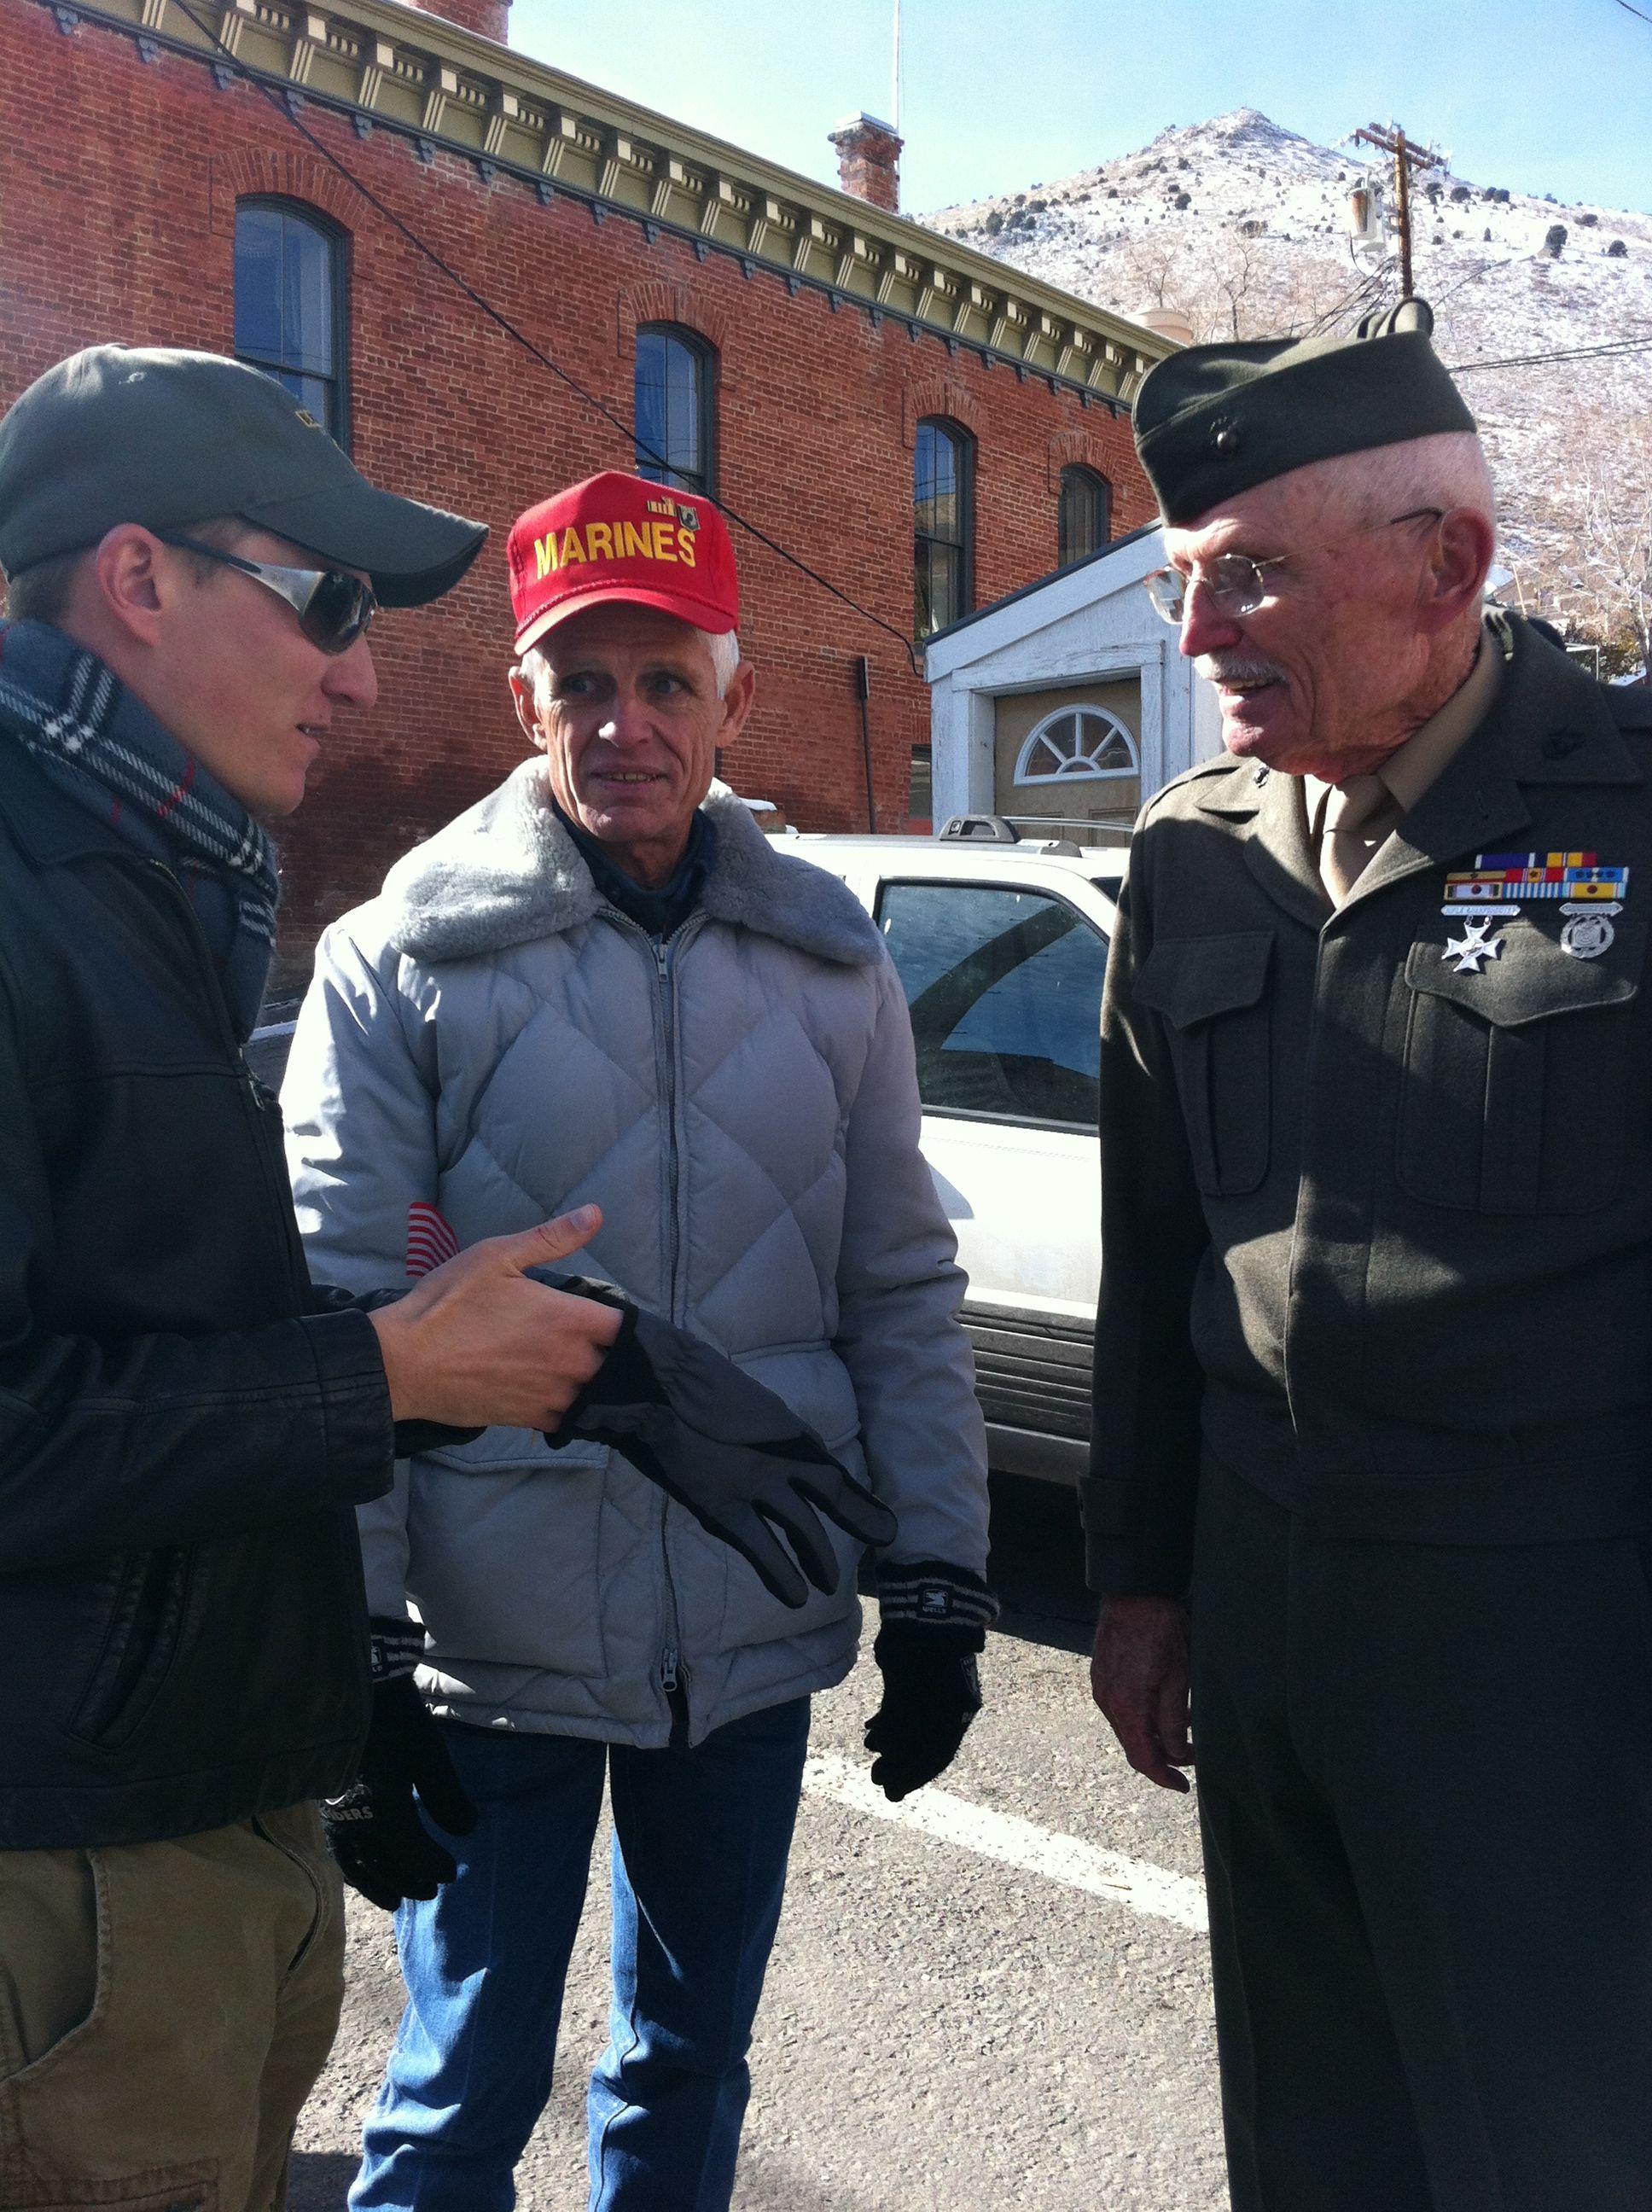 Korean,Vietnam, Iraq/Afghanistan veterans on vets day in Virginia city nv